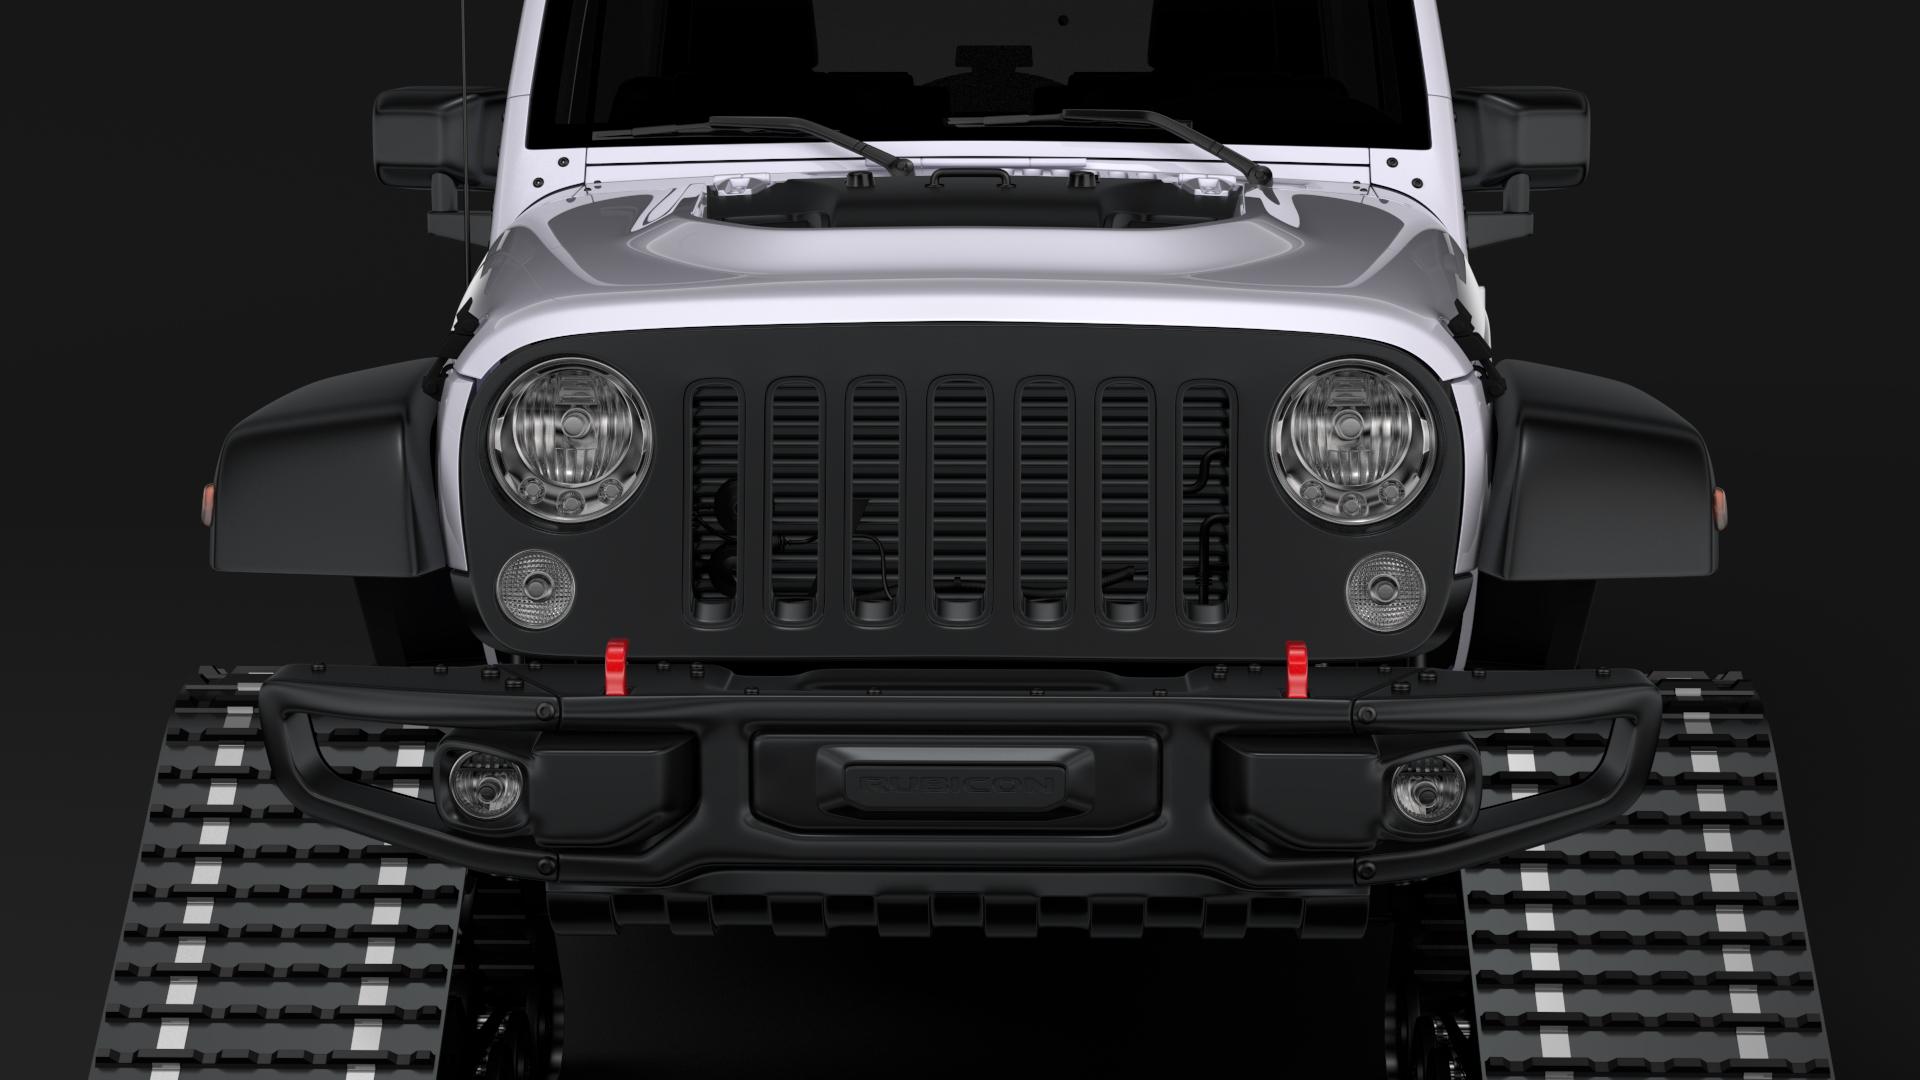 jeep wrangler crawler rubicon recon jk 2017 3d model max fbx c4d lwo ma mb hrc xsi obj 276909